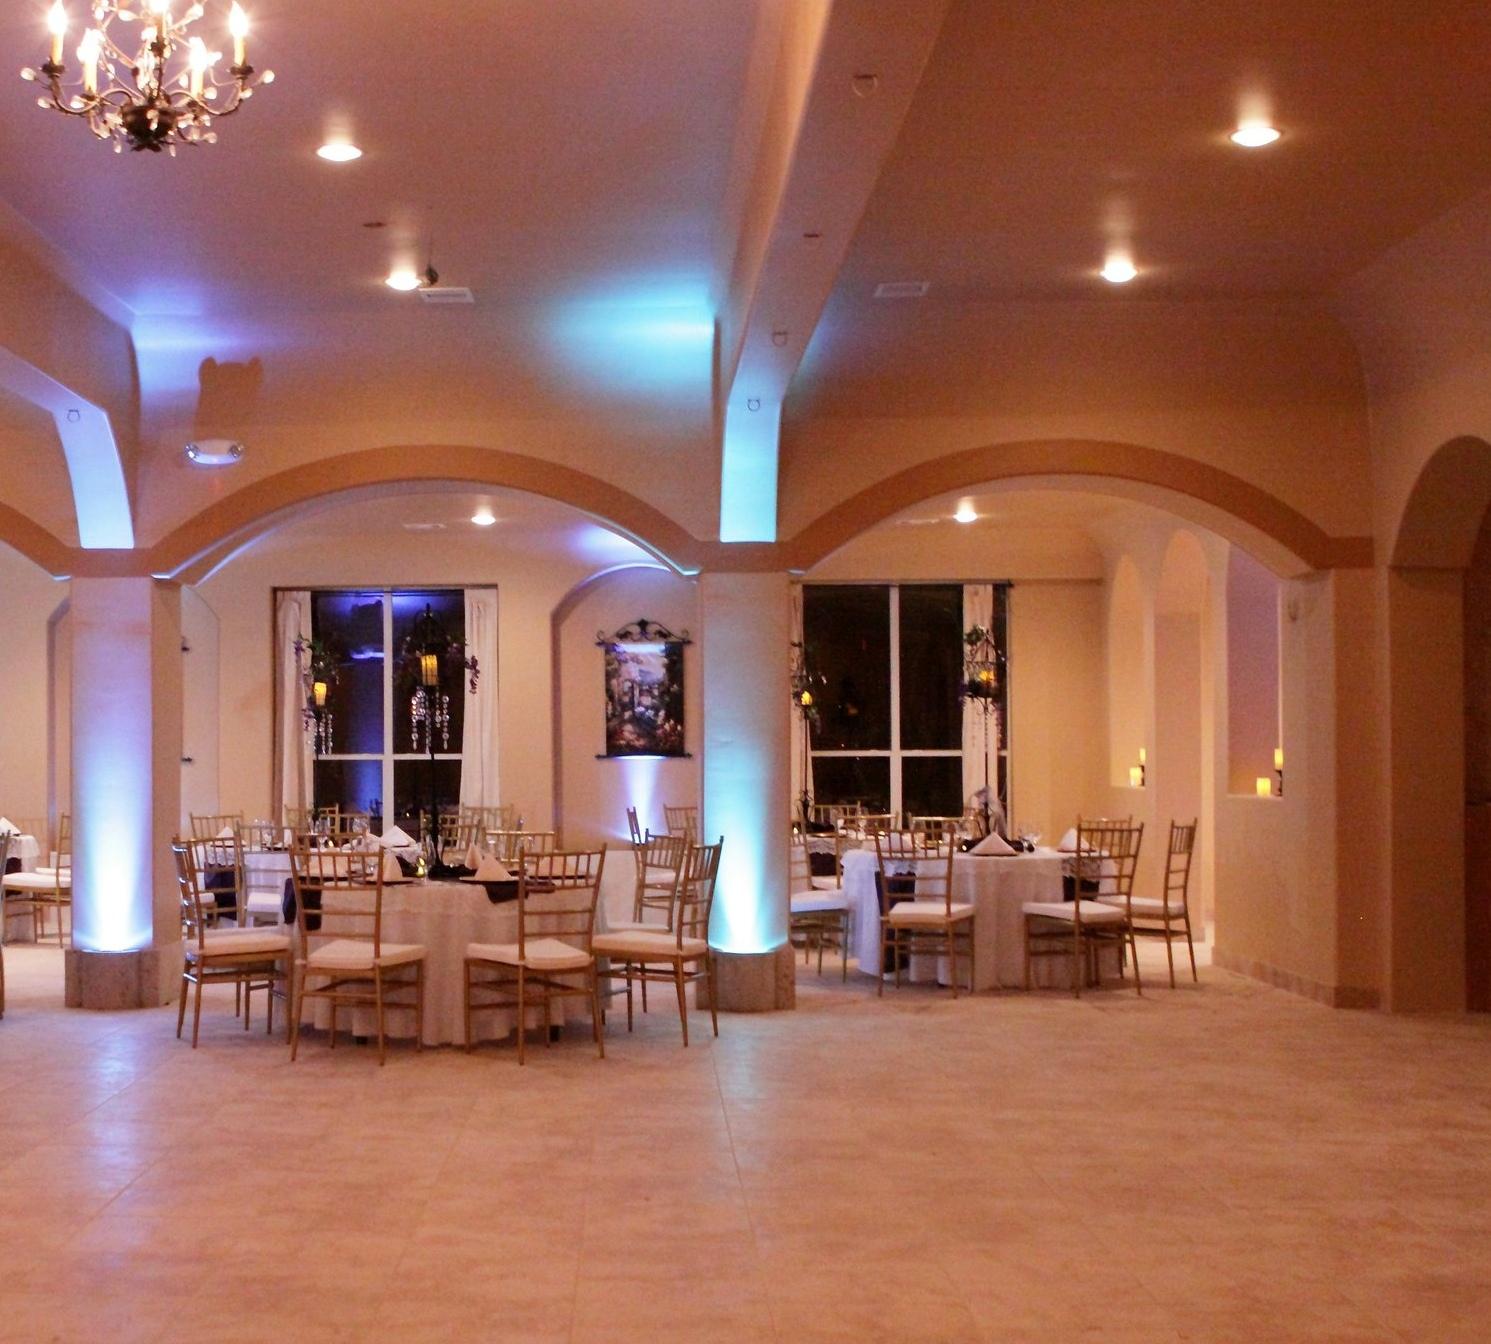 Wedding Reception Halls In Houston Texas : Reception halls in houston tx